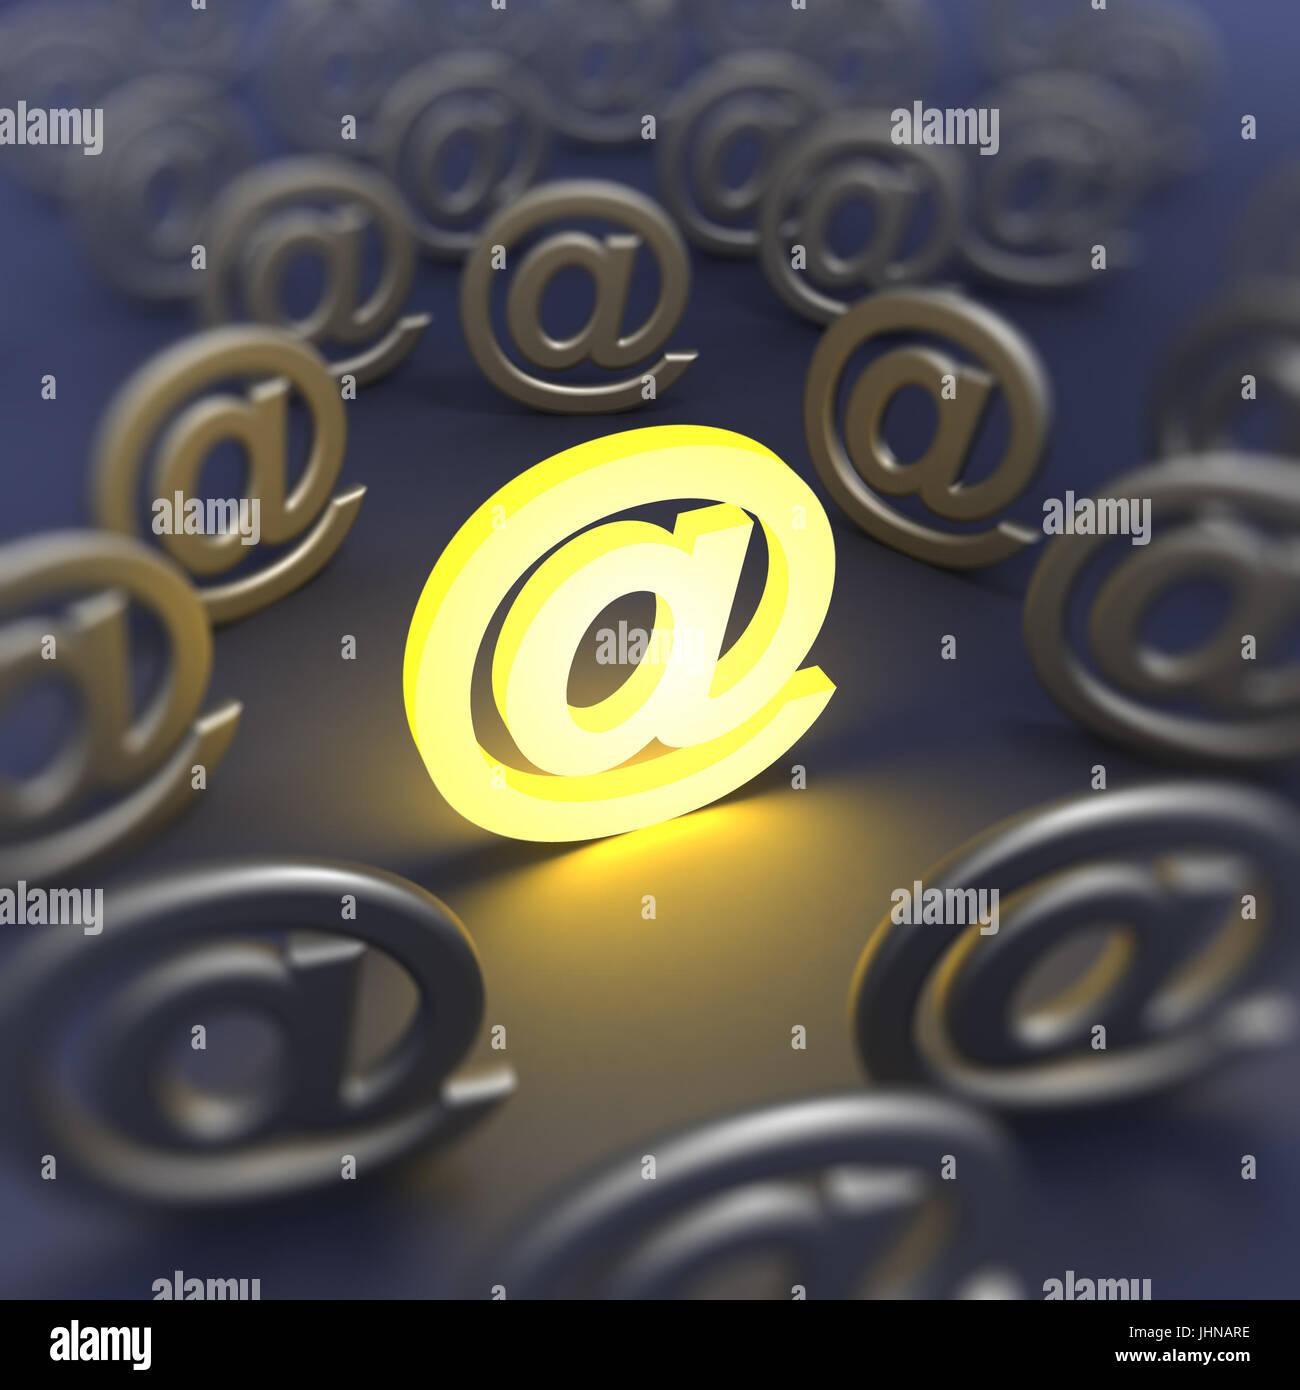 e-mail sign defocused - Stock Image